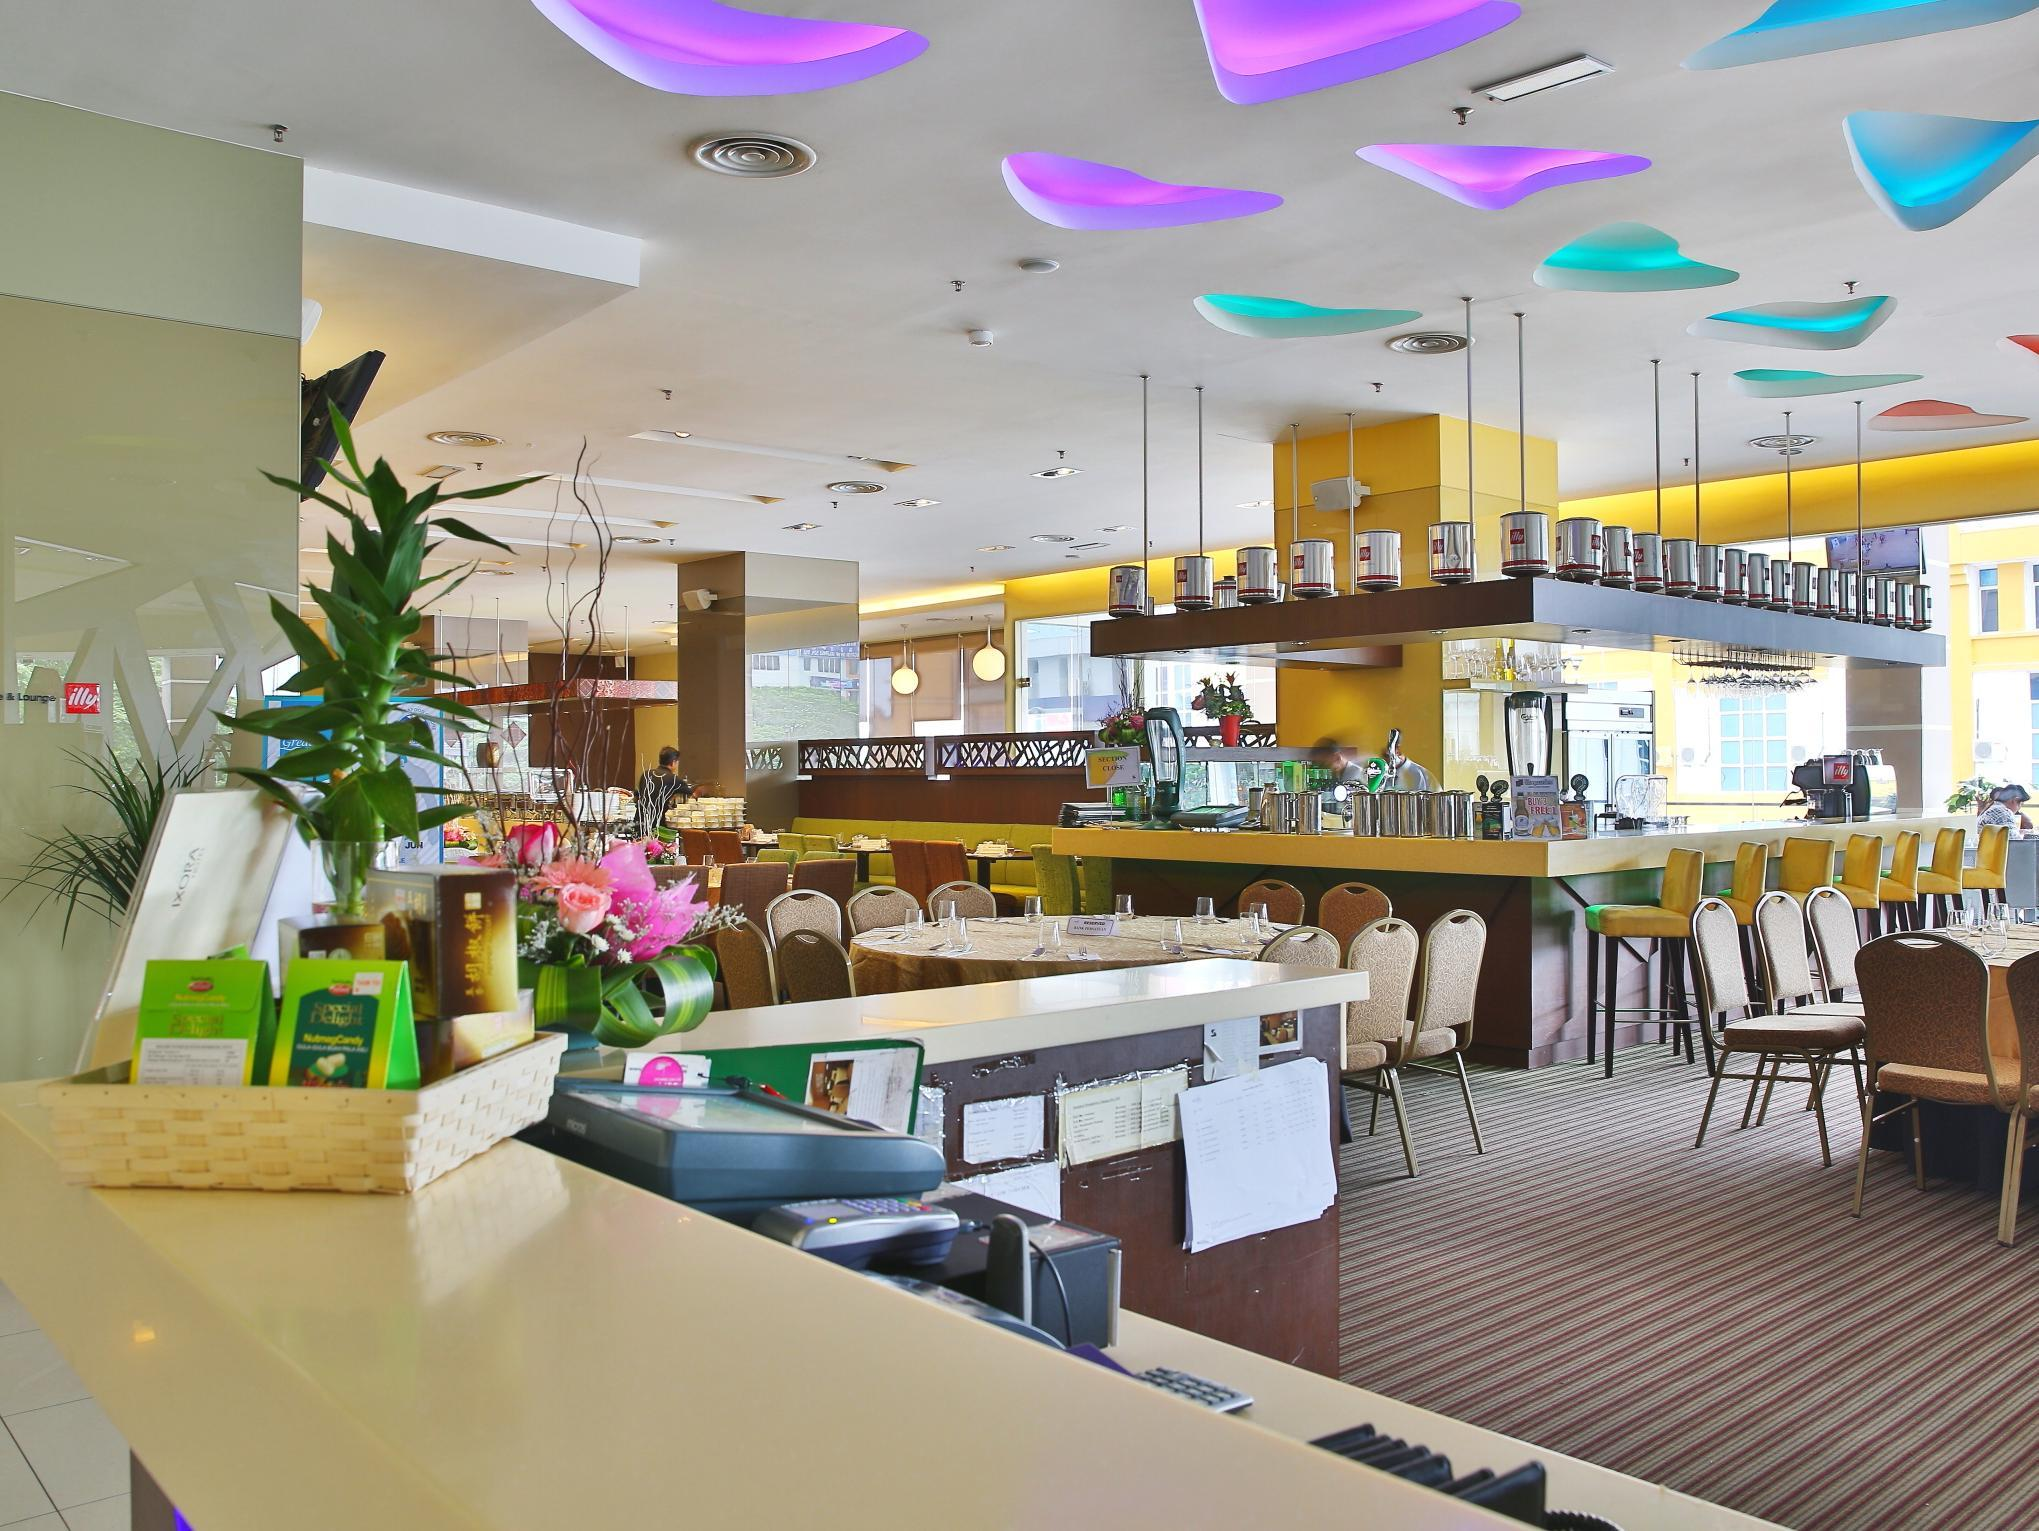 Penang Club Room Rates